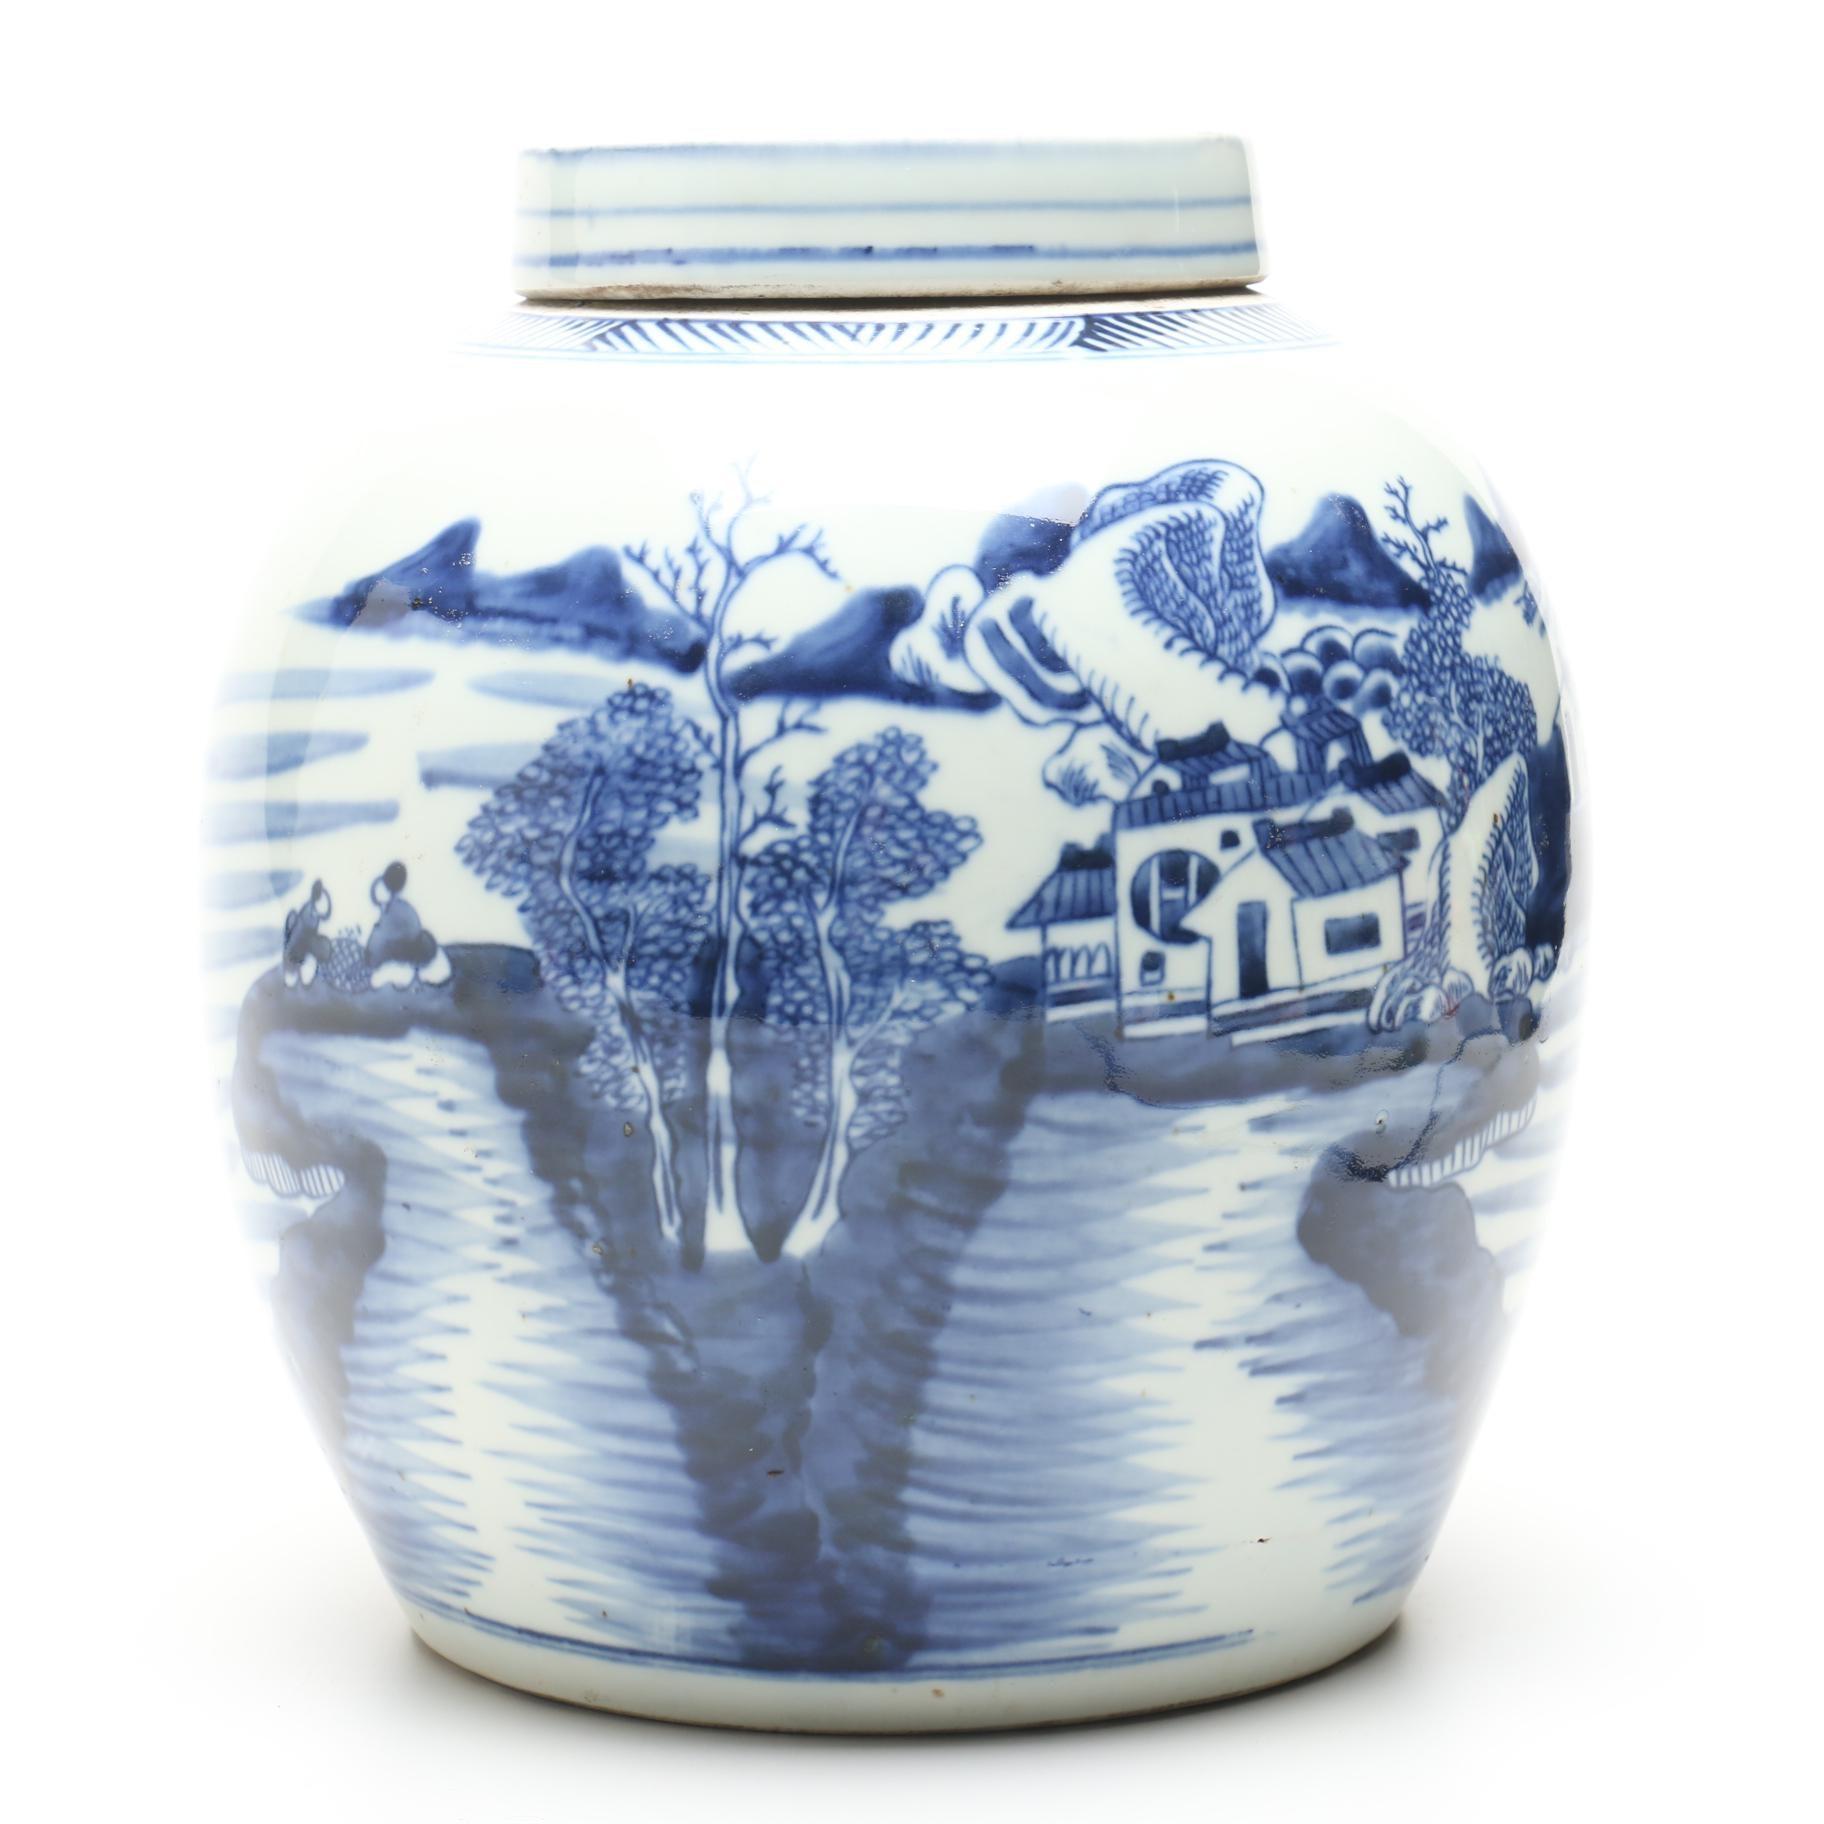 Chinese Blue and White Ceramic Ginger Jar